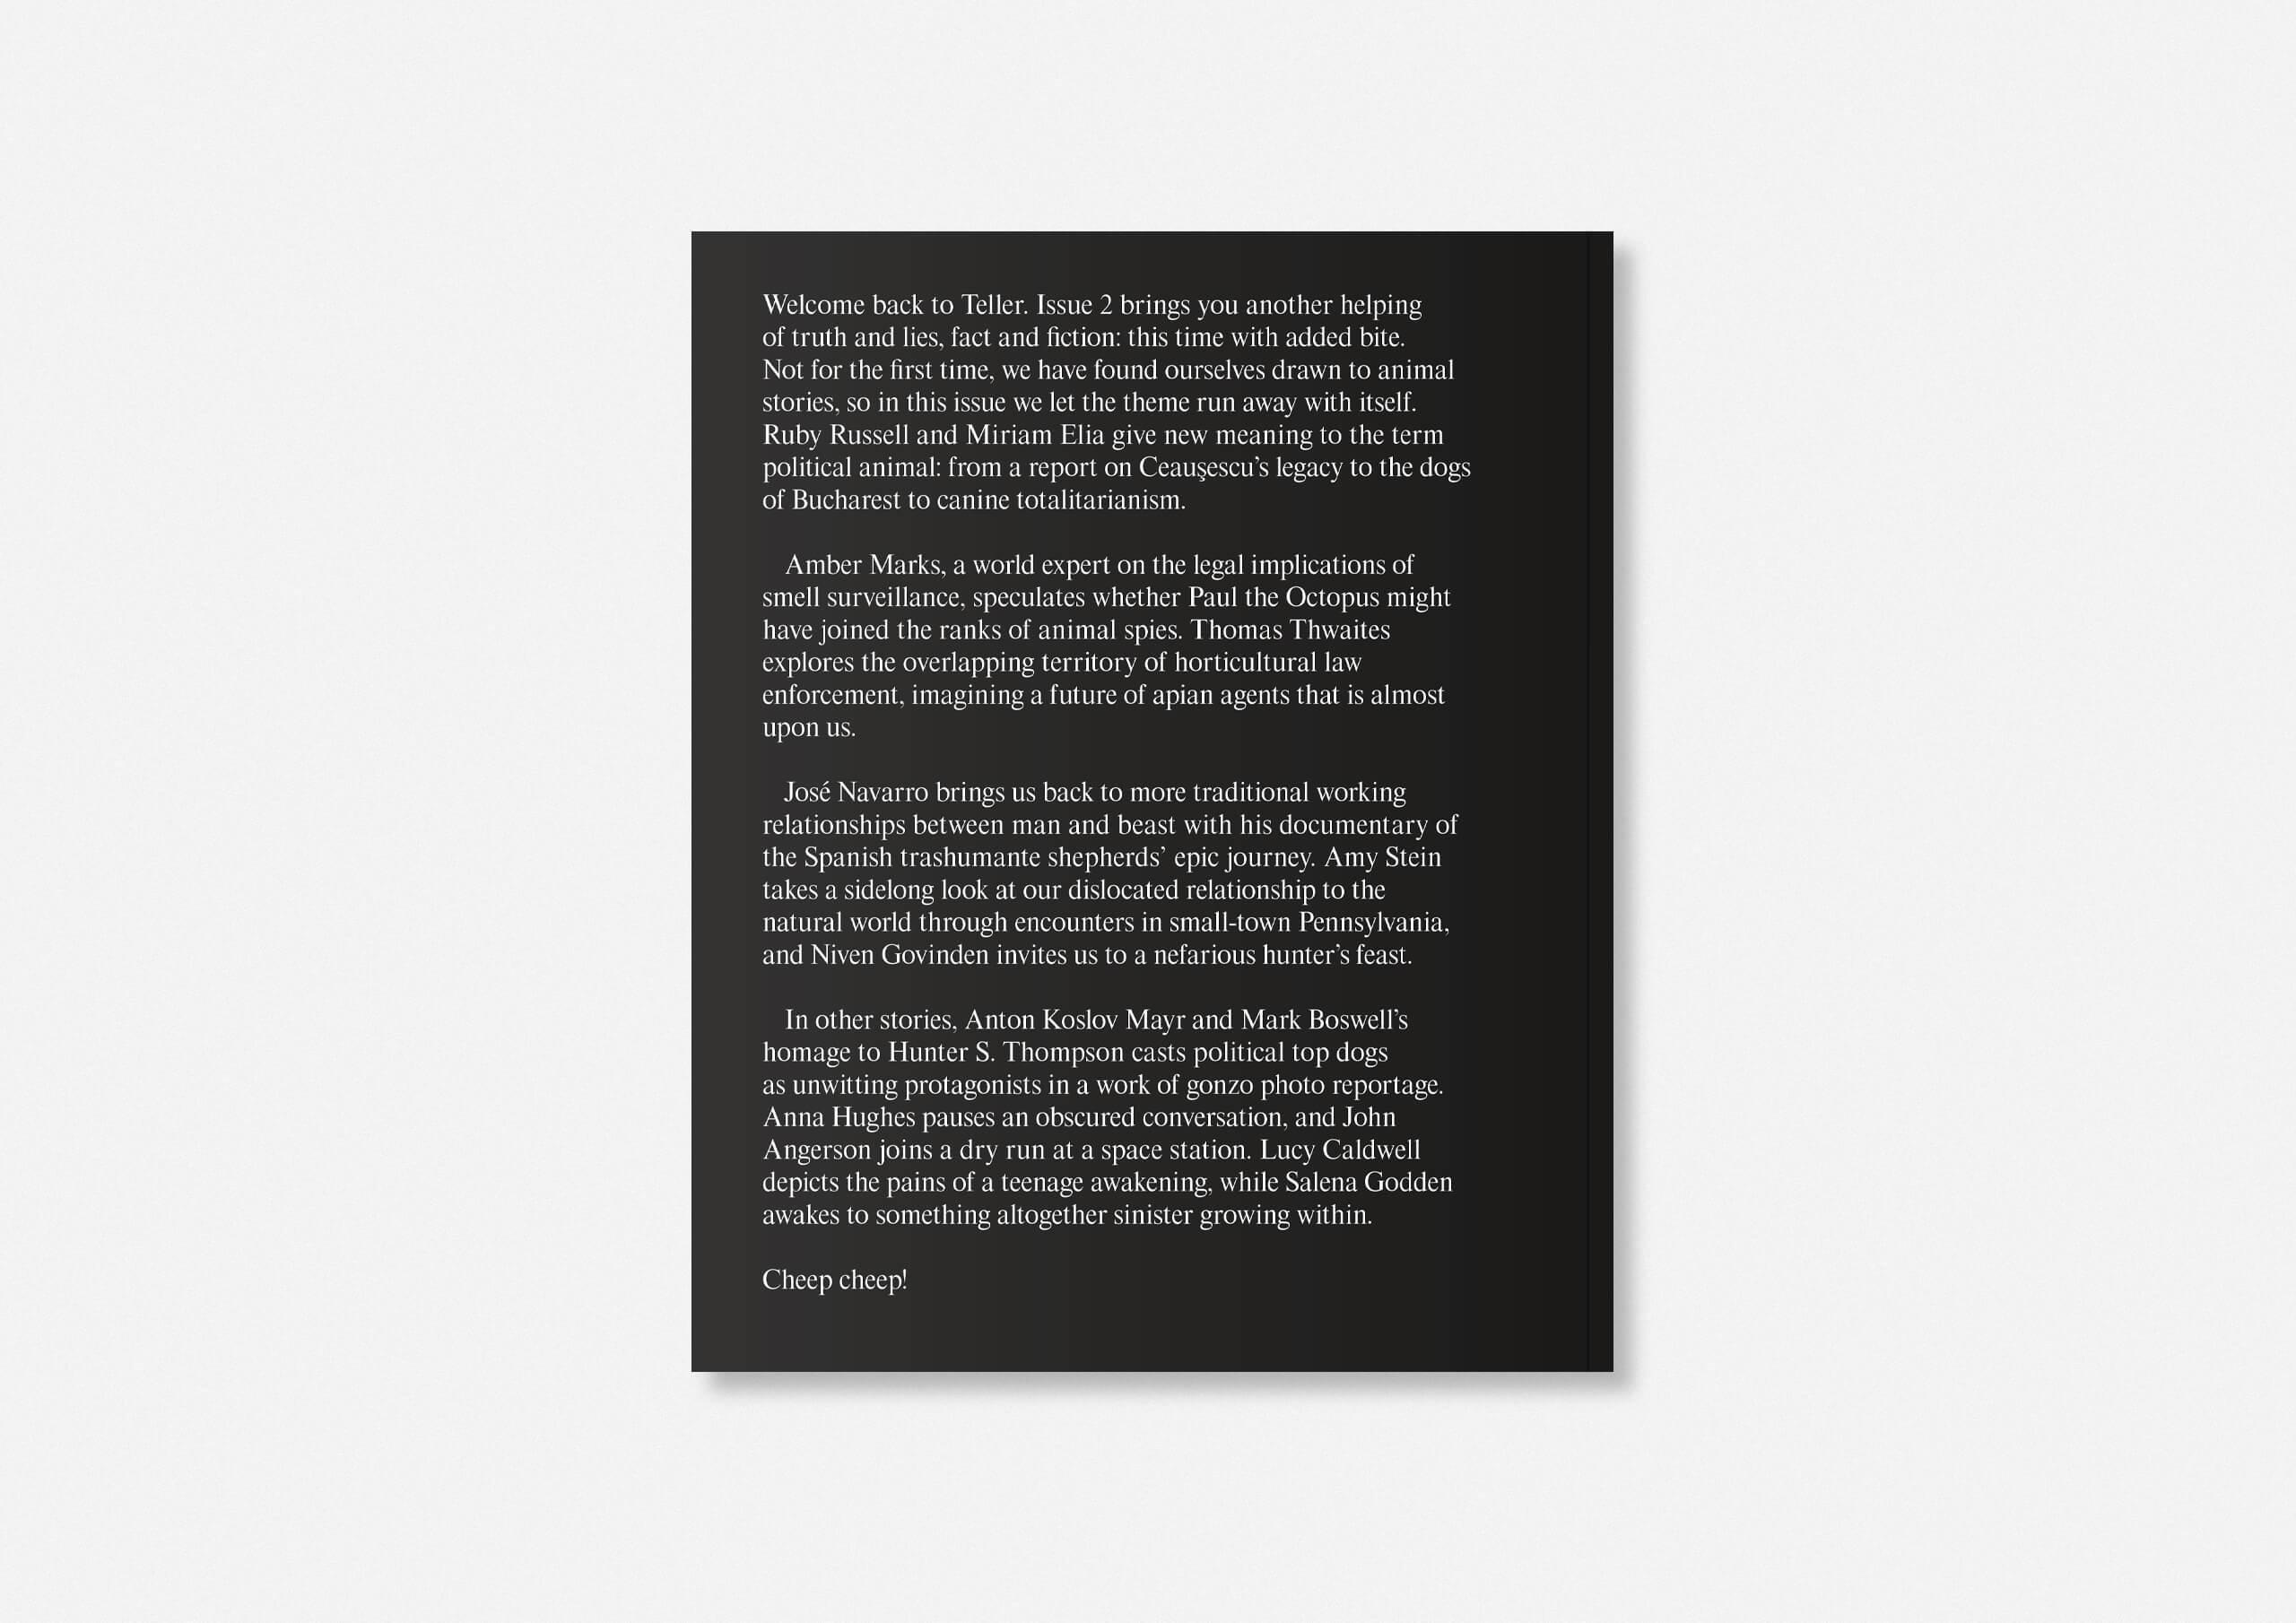 https://neuegestaltung.de/media/pages/clients/teller-magazine-issue-2/8021ad2d39-1597415081/teller_issue_02_ruckseite_ng.jpg